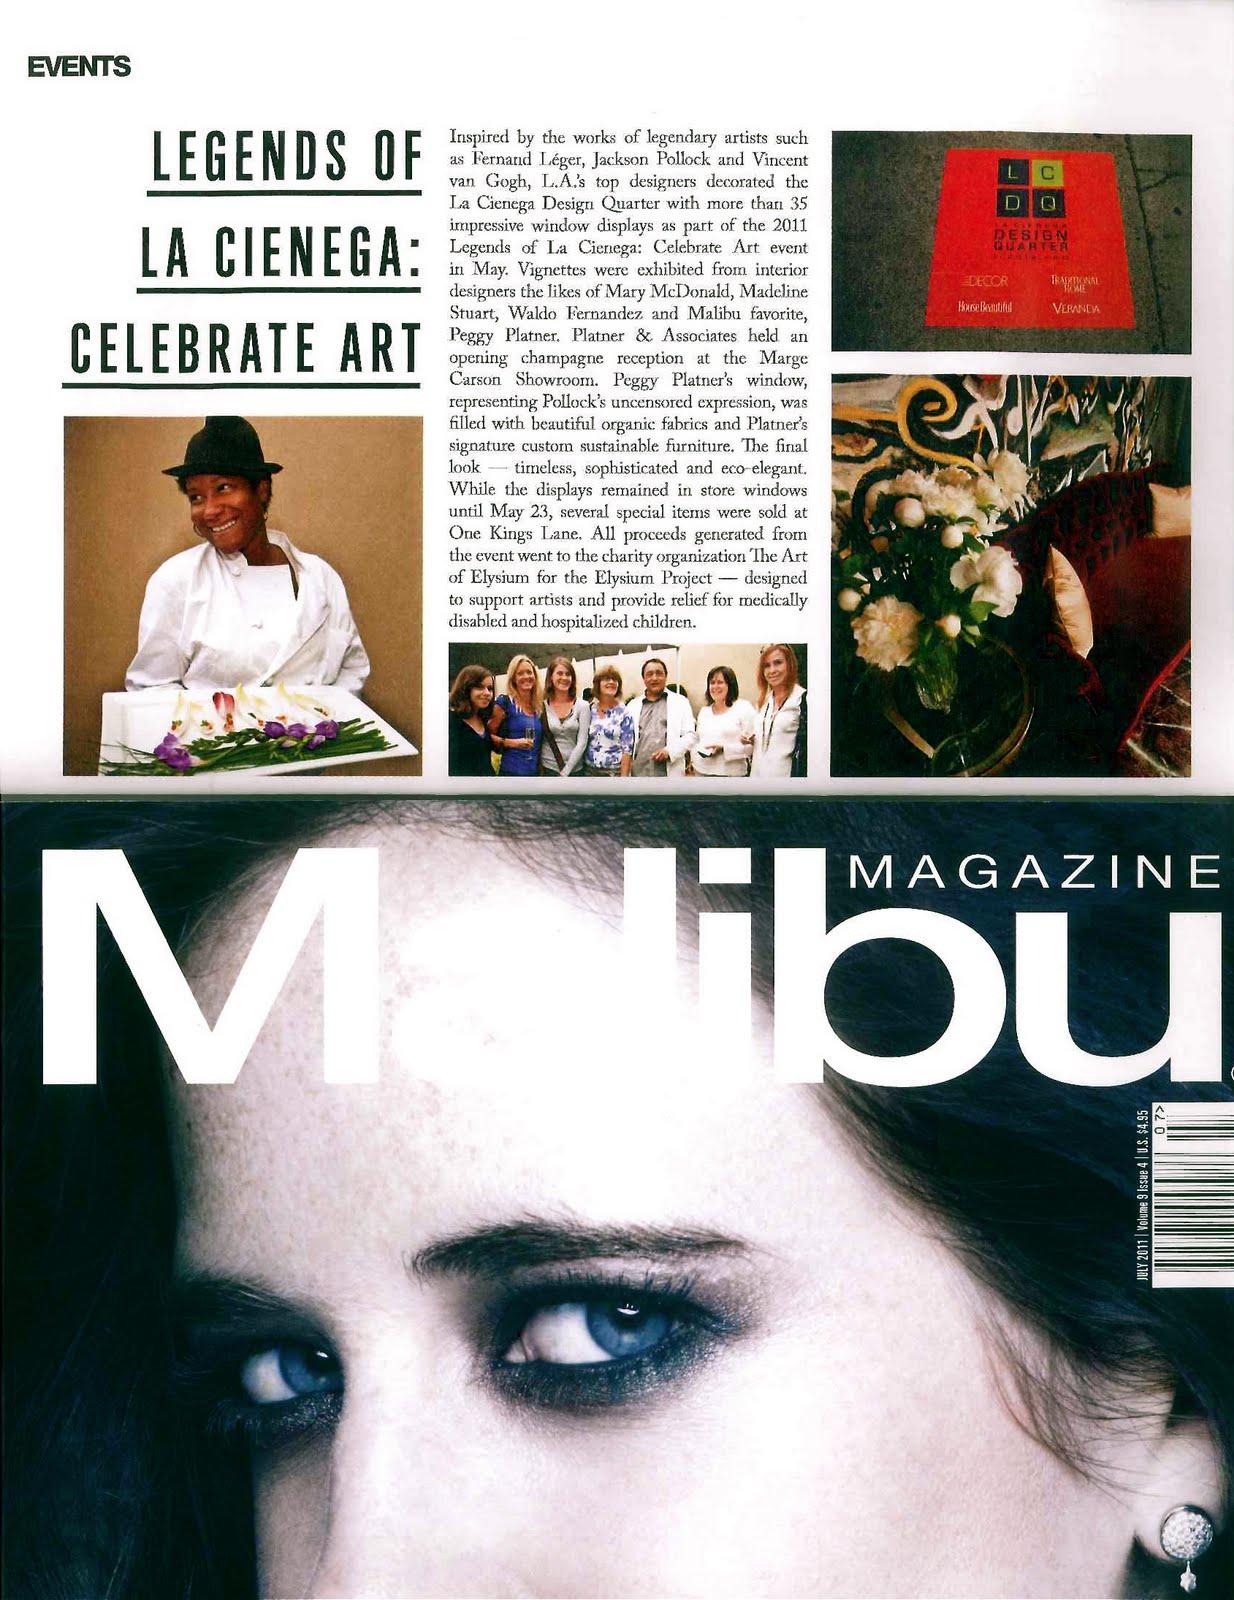 MALIBU MAGAZINE COVERS PEGGY PLATNERS LCDQCELEBRATE ART EVENT Jun 10 Tags Los Angeles Interior Design